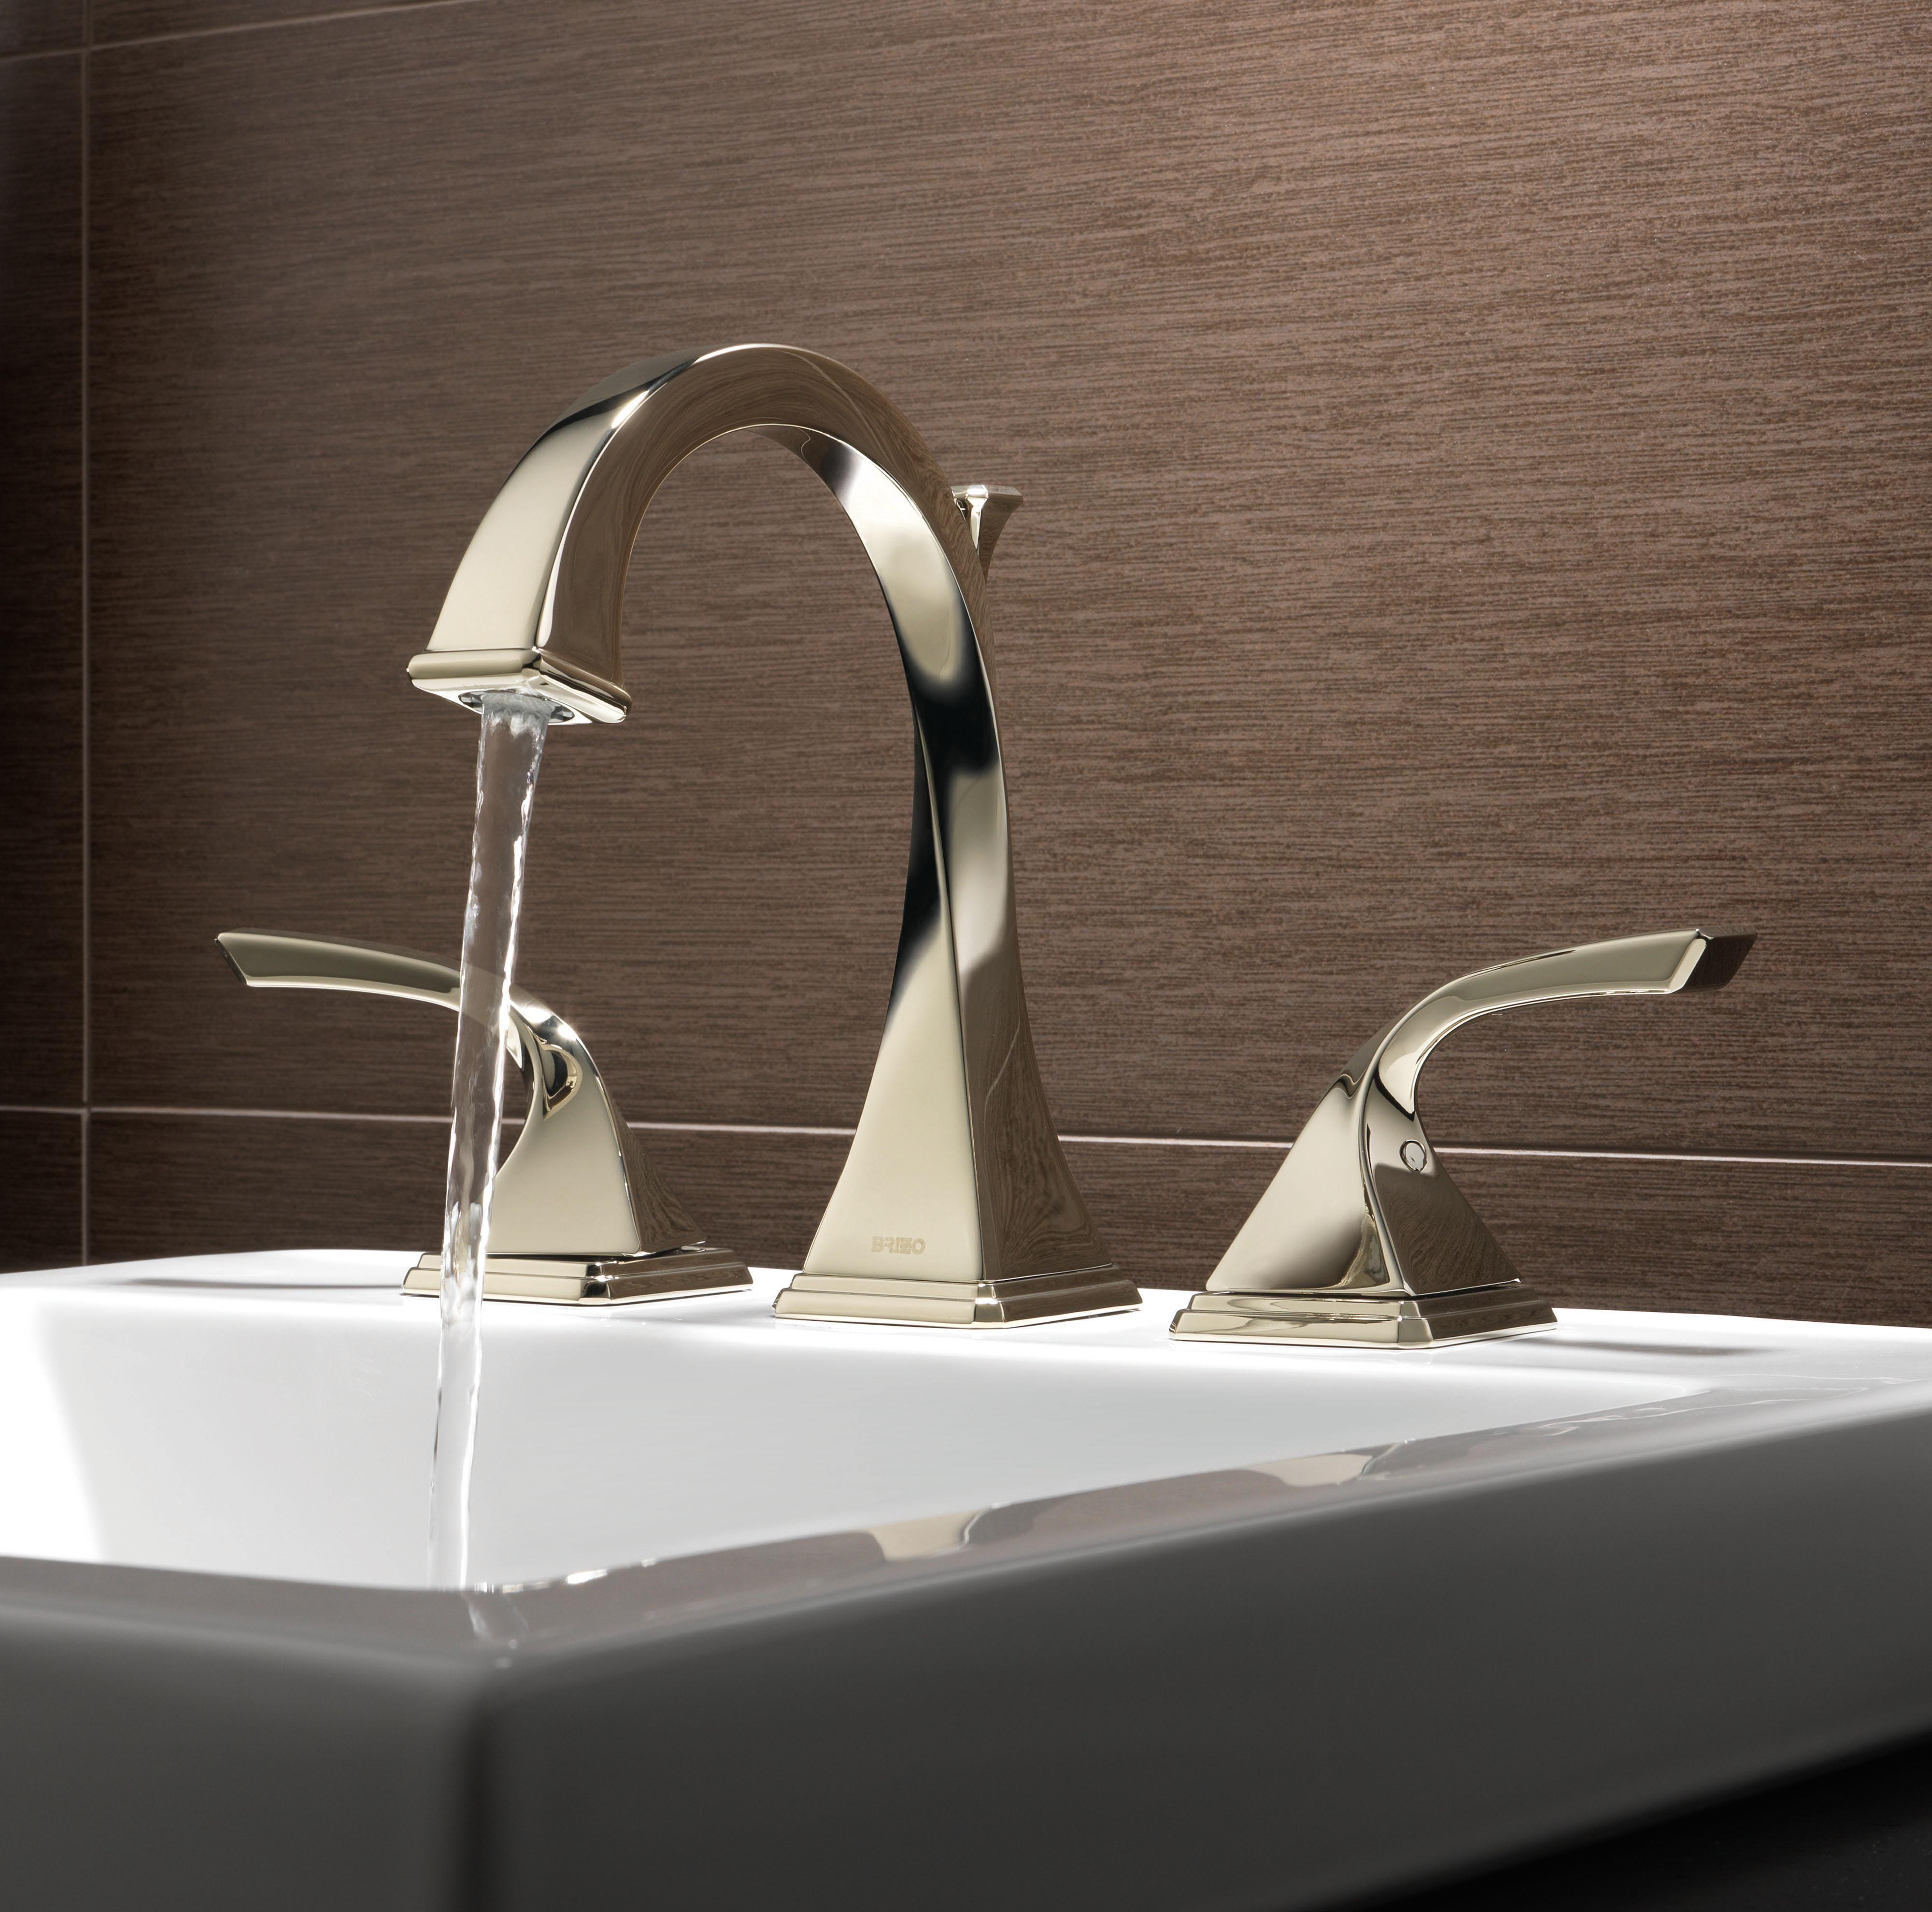 Love The Tile Backsplash Too Brizo Virage Bathroom Faucets Modenus Catalog Bathroom Faucets Widespread Bathroom Faucet Bathroom Faucets Brushed Nickel